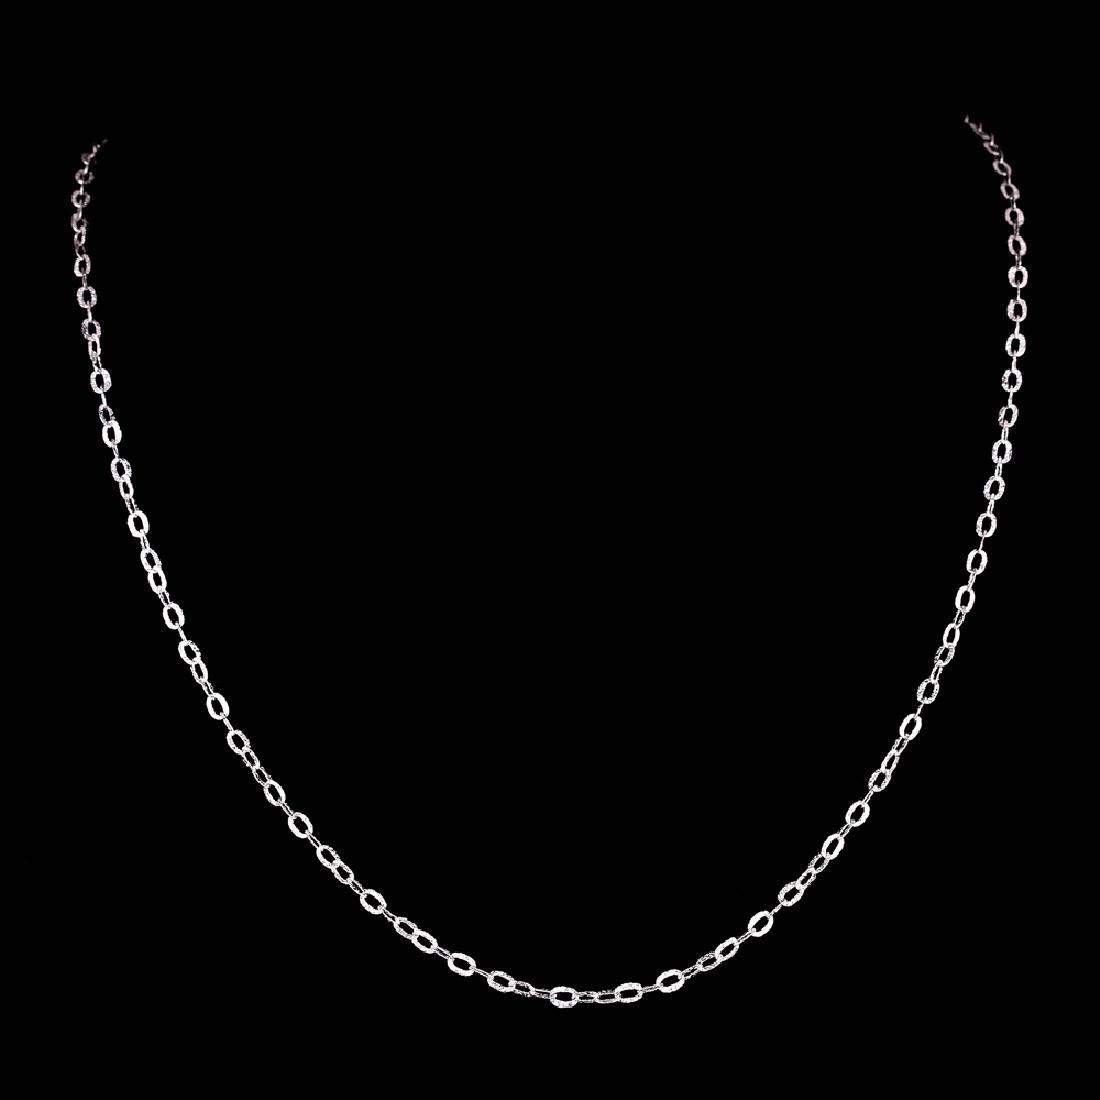 *Fine Jewelry 14KT White Gold, 2.0GR, 18'' Corrugated